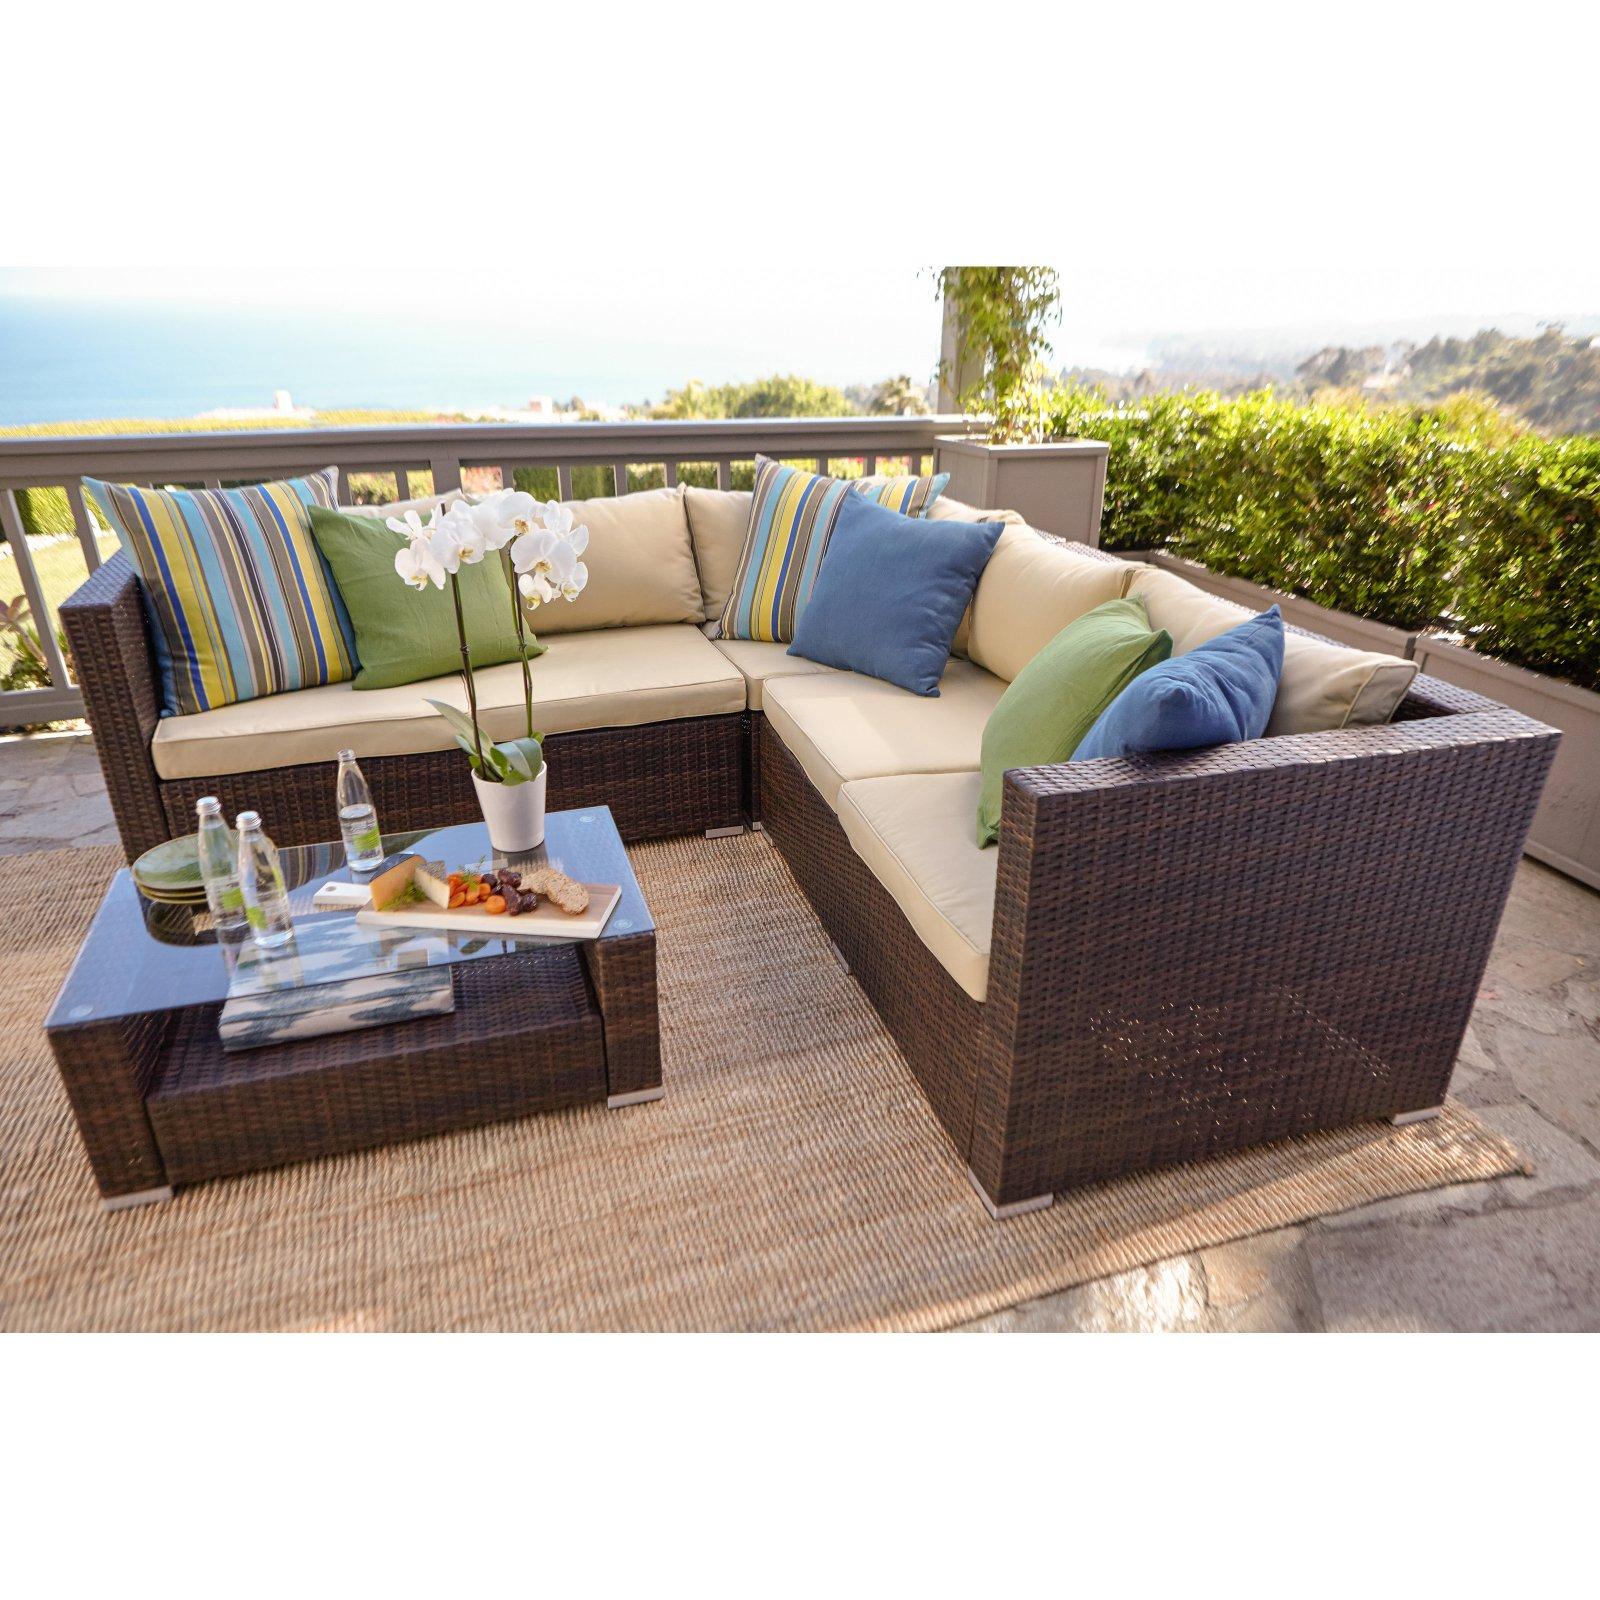 Oakville Luxury Modern 5 Piece Outdoor Patio Garden Furniture